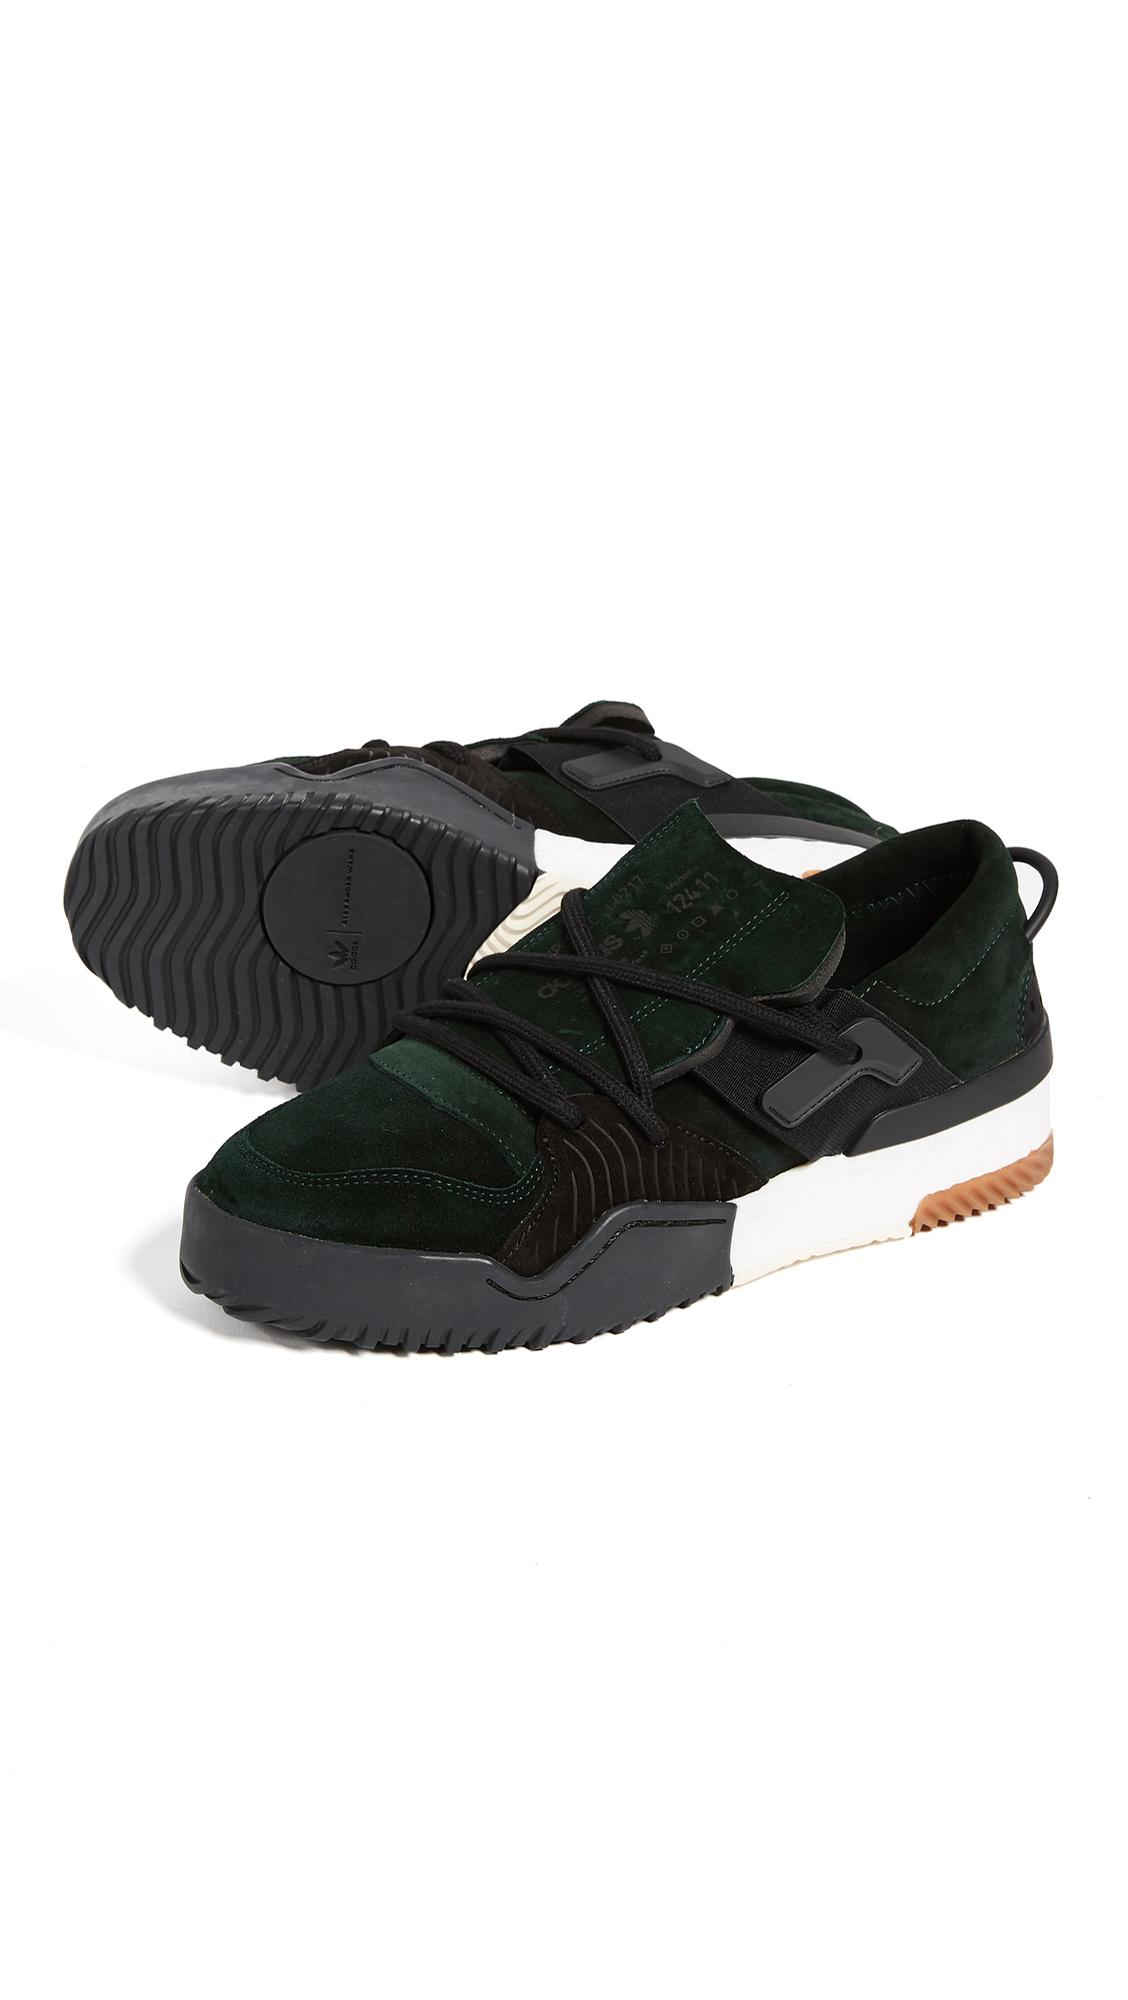 timeless design 81030 e939a adidas Originals by Alexander Wang AW BBall Low Top Sneakers